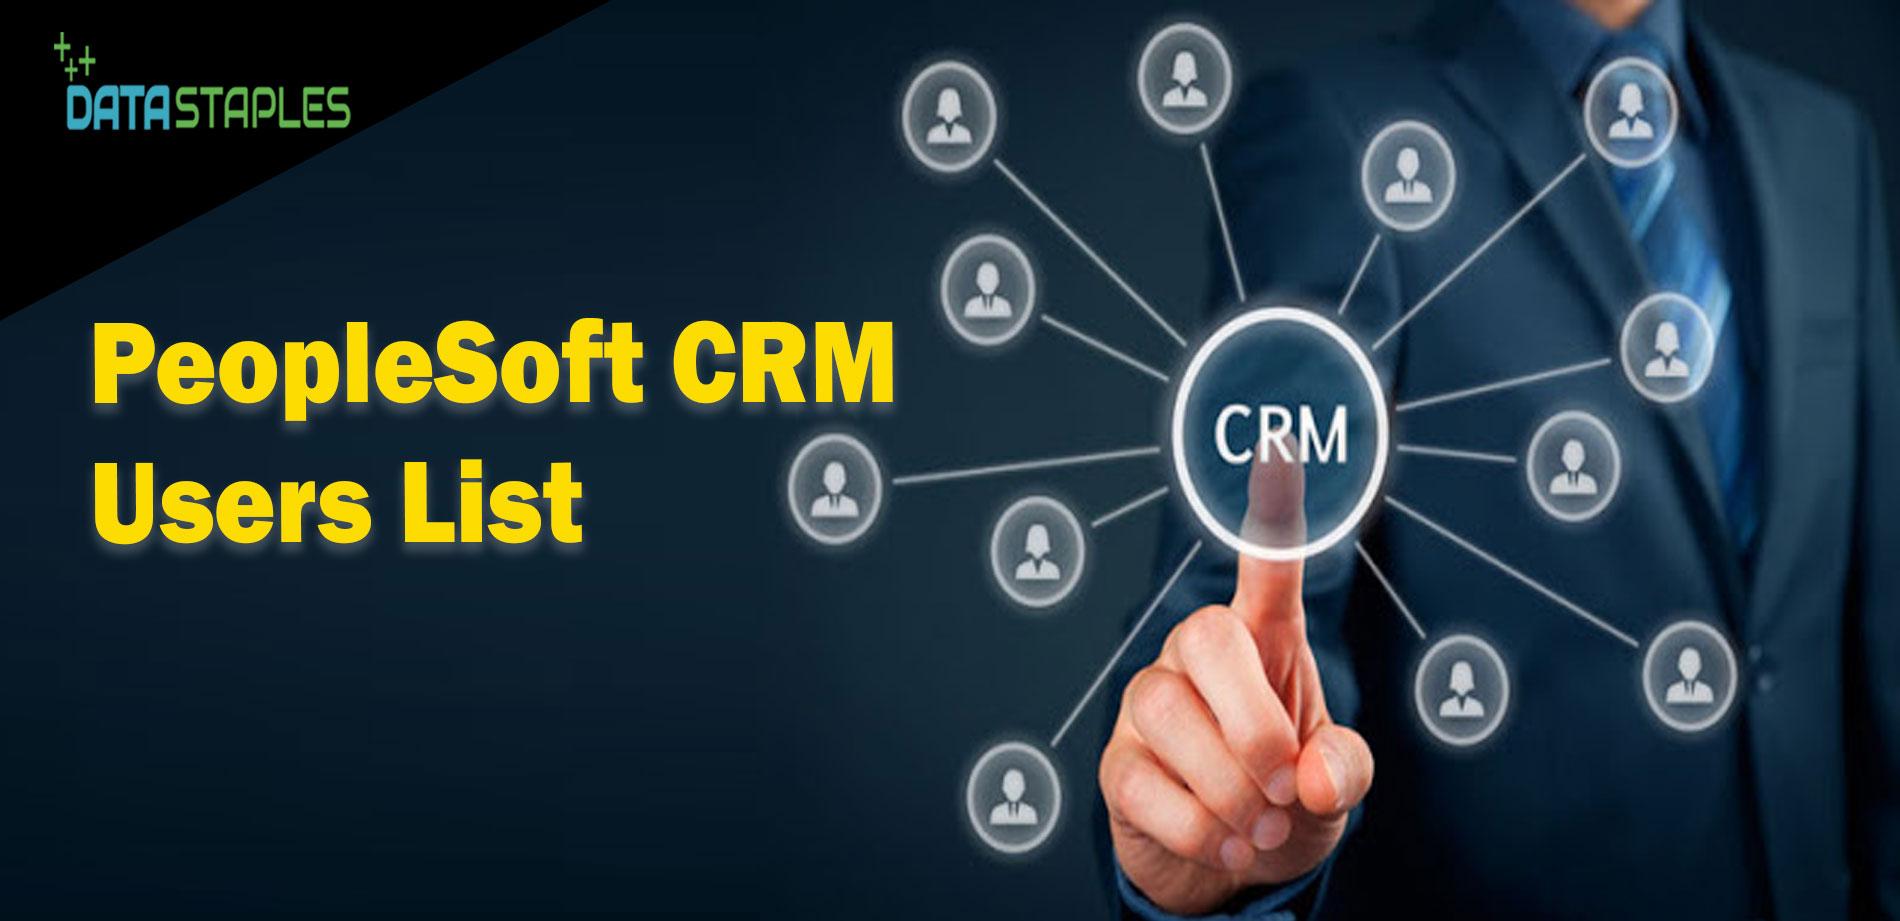 PeopleSoft CRM Users Mailing List | DataStaples